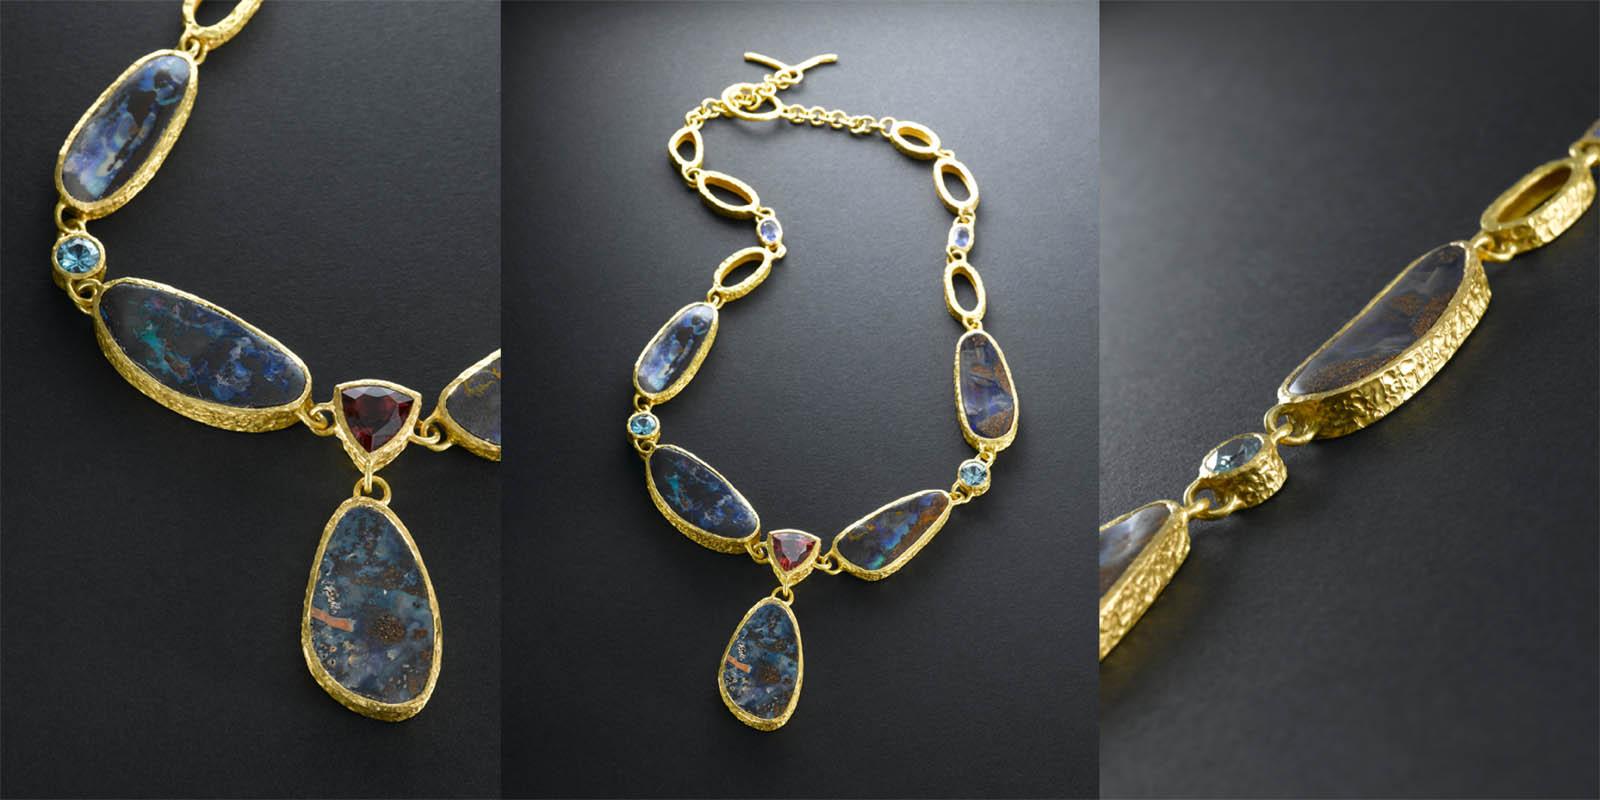 22 karat gold, boulder opals, brazilian tourmaline, zircons and tanzanites